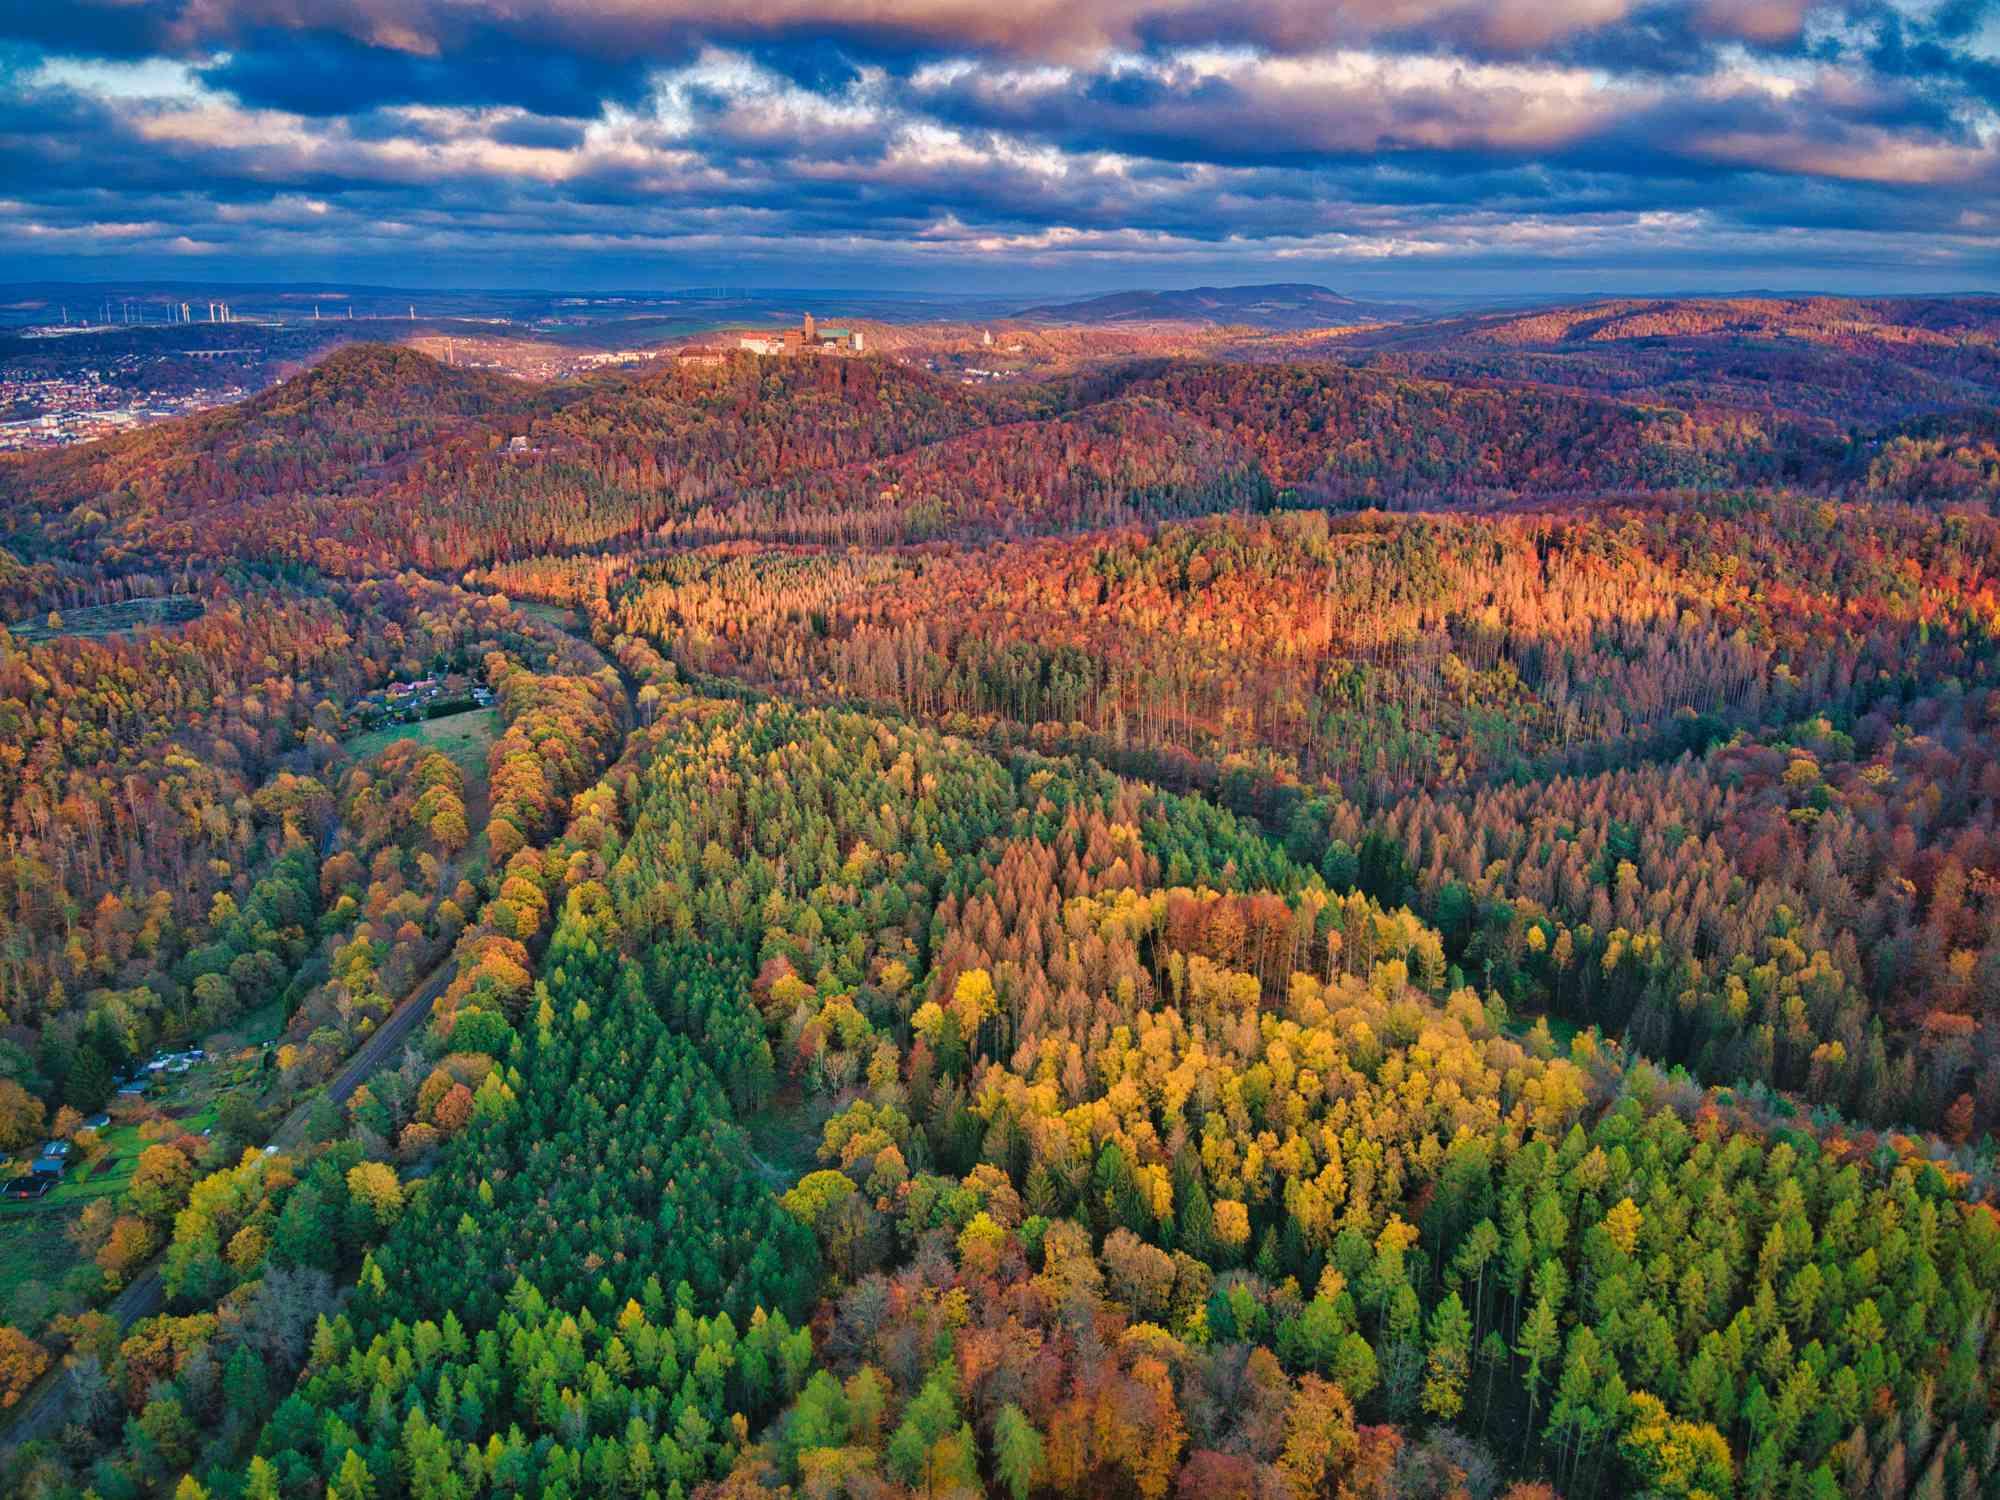 Aerial view above autumn forest in Wartburg